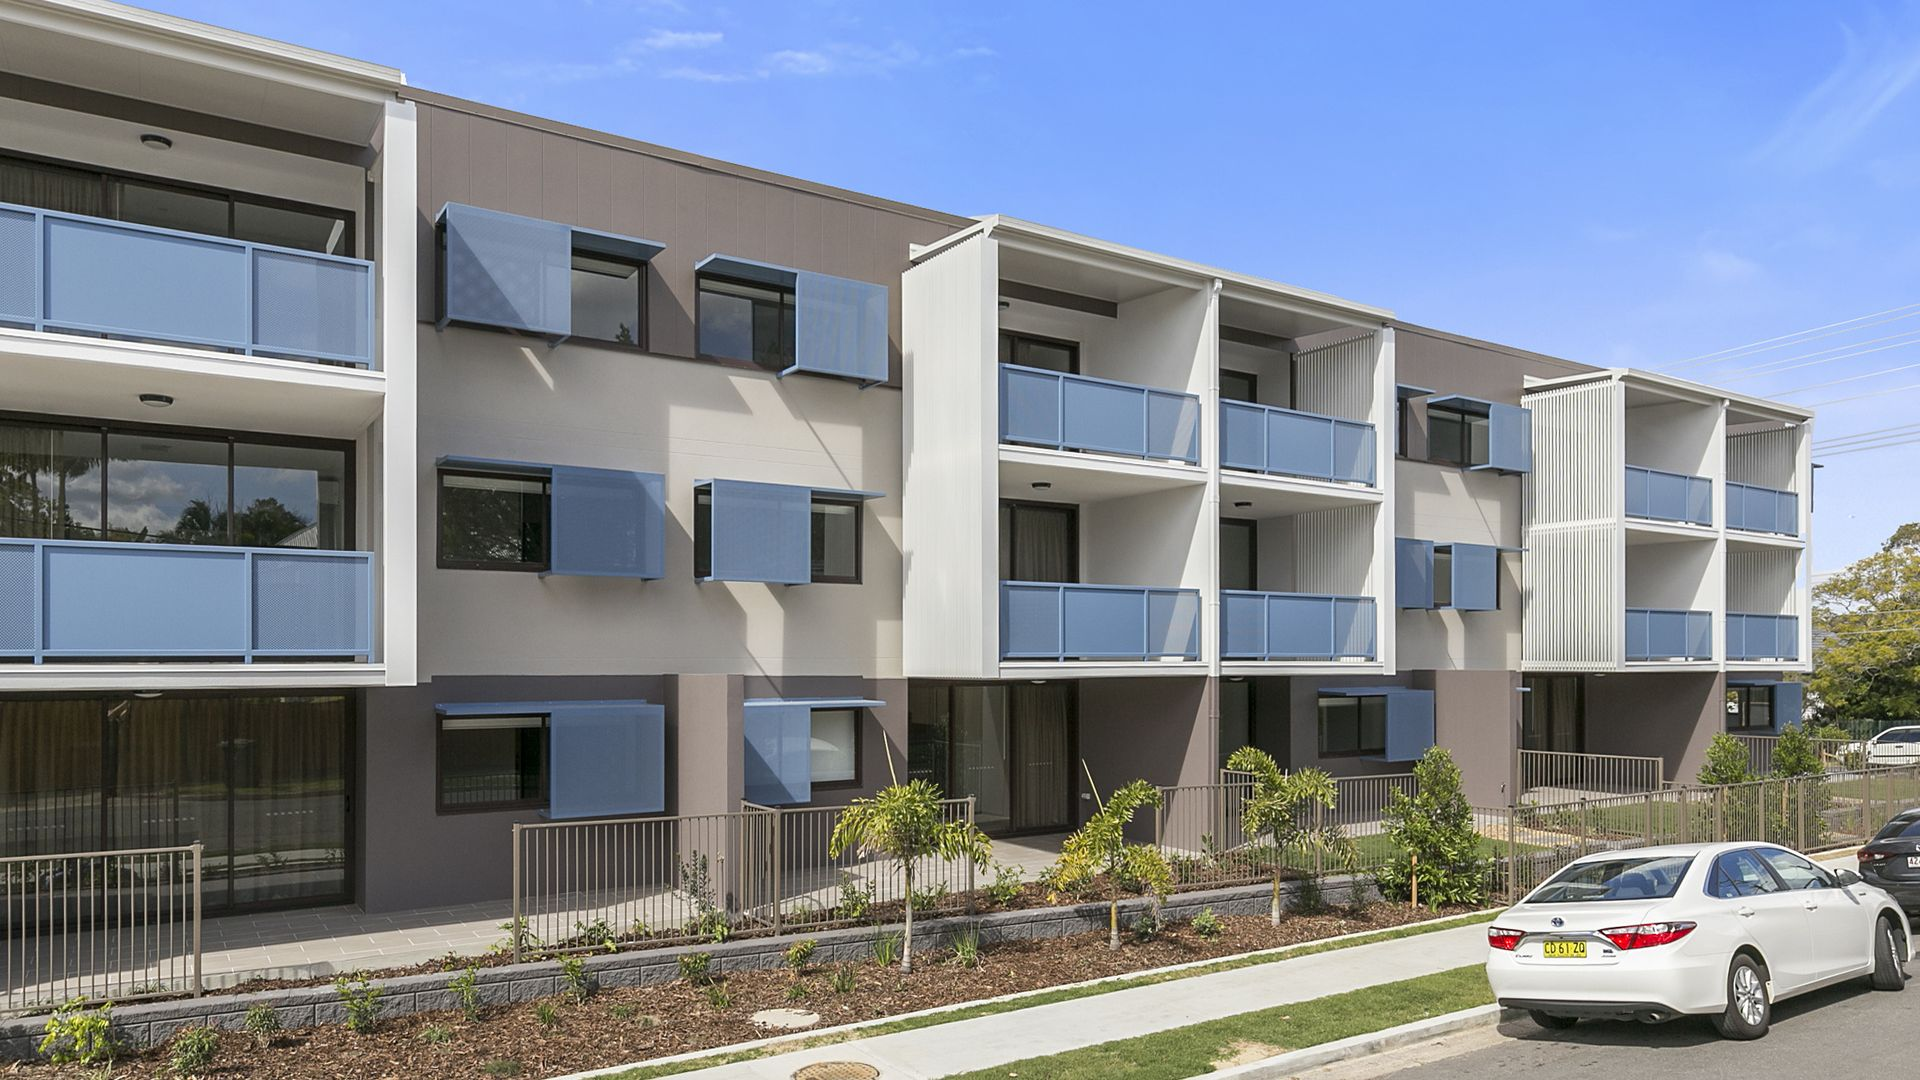 12/62 Richmond Road, Morningside QLD 4170, Image 7